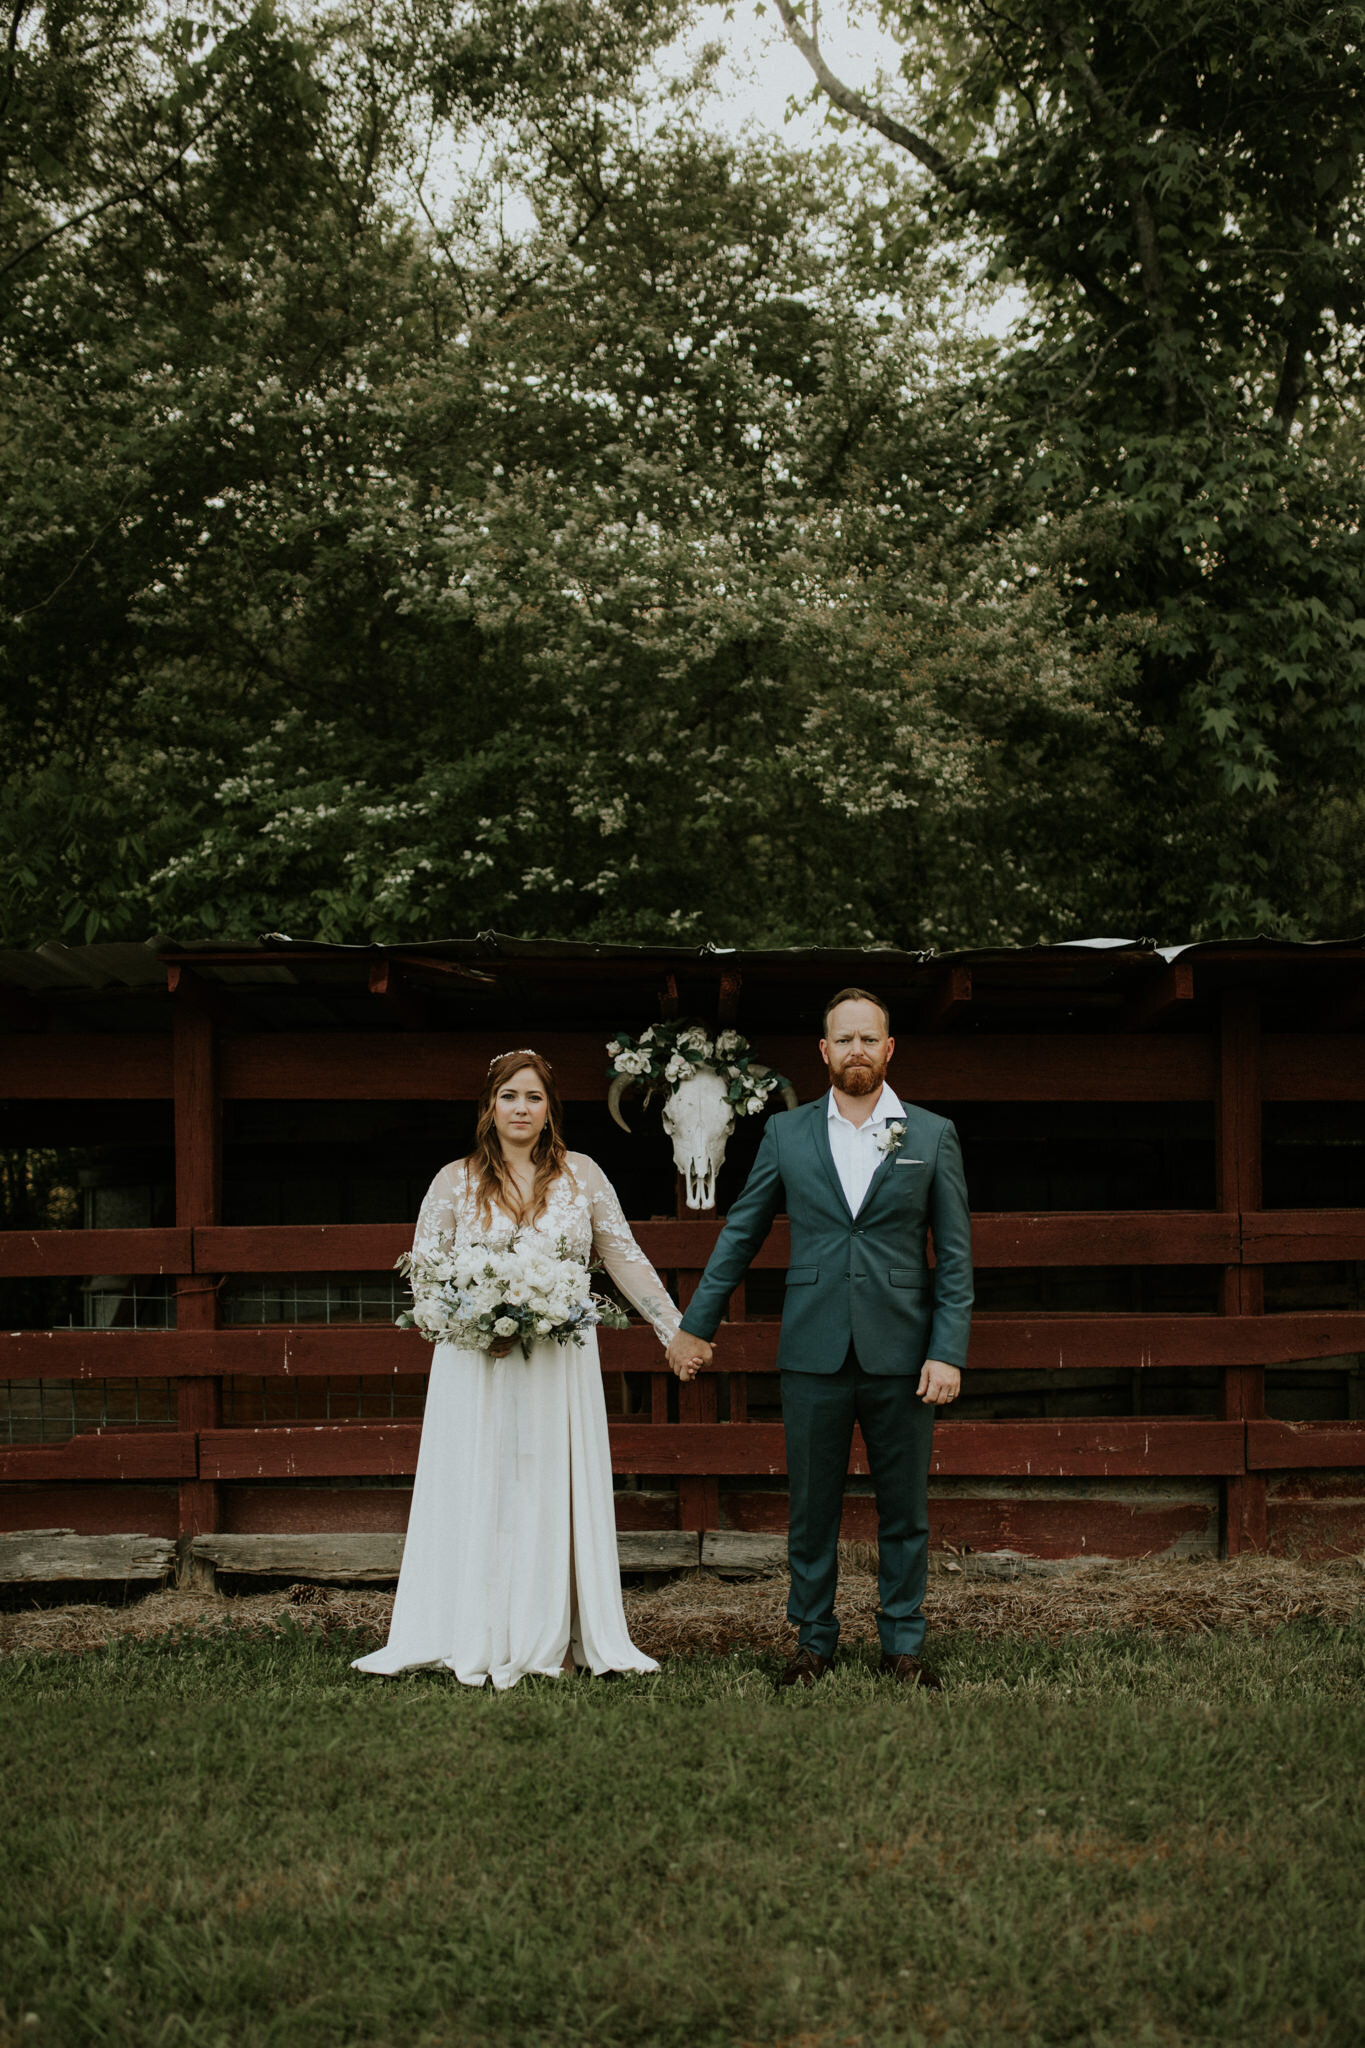 KateMatt-North-Georgia-Wedding-Photographer-Mountain-Laurel-Farm-134.jpg